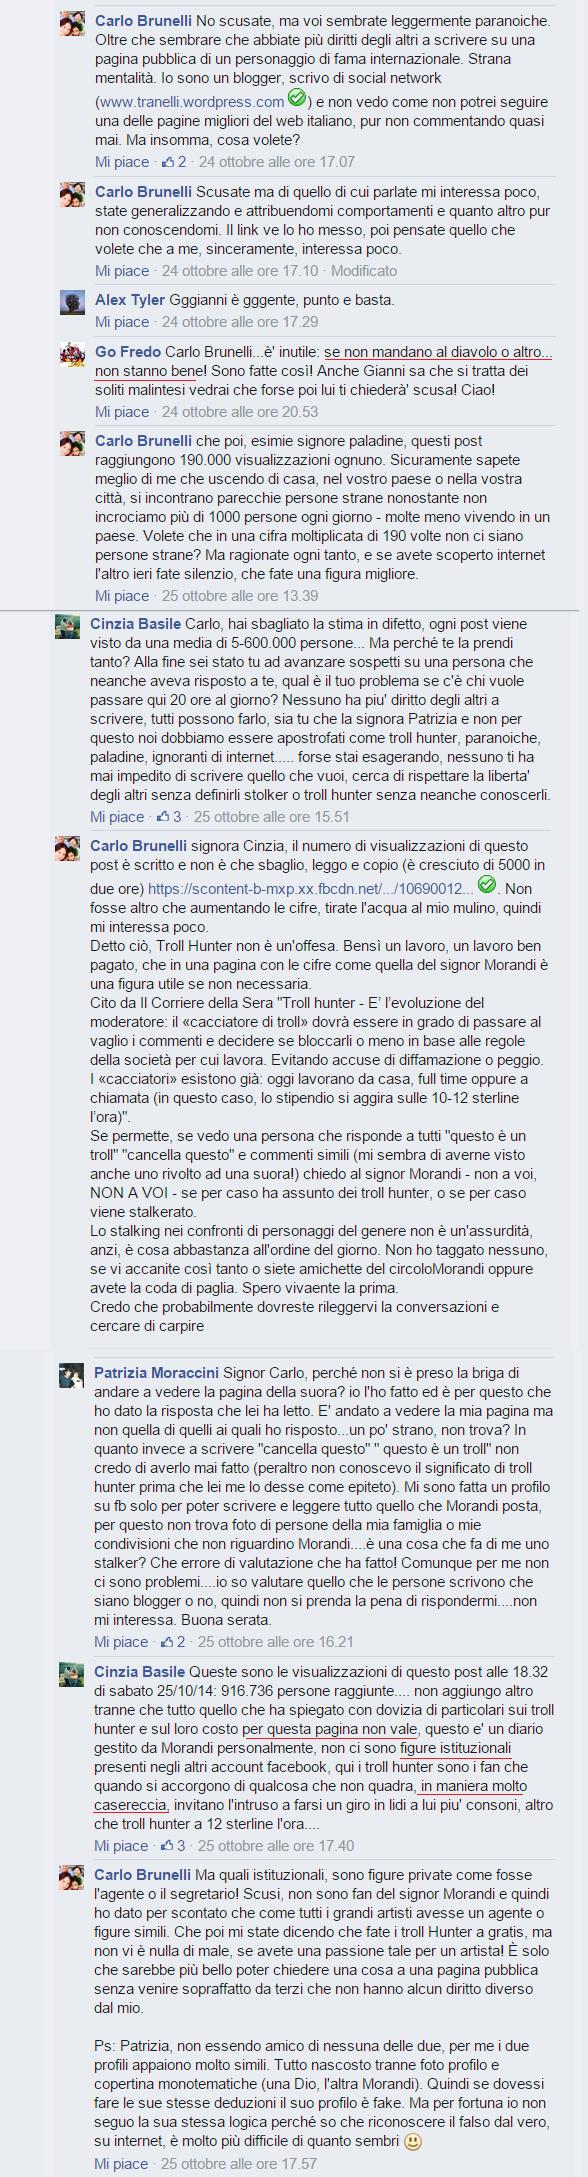 Gianni Morandi post mio2